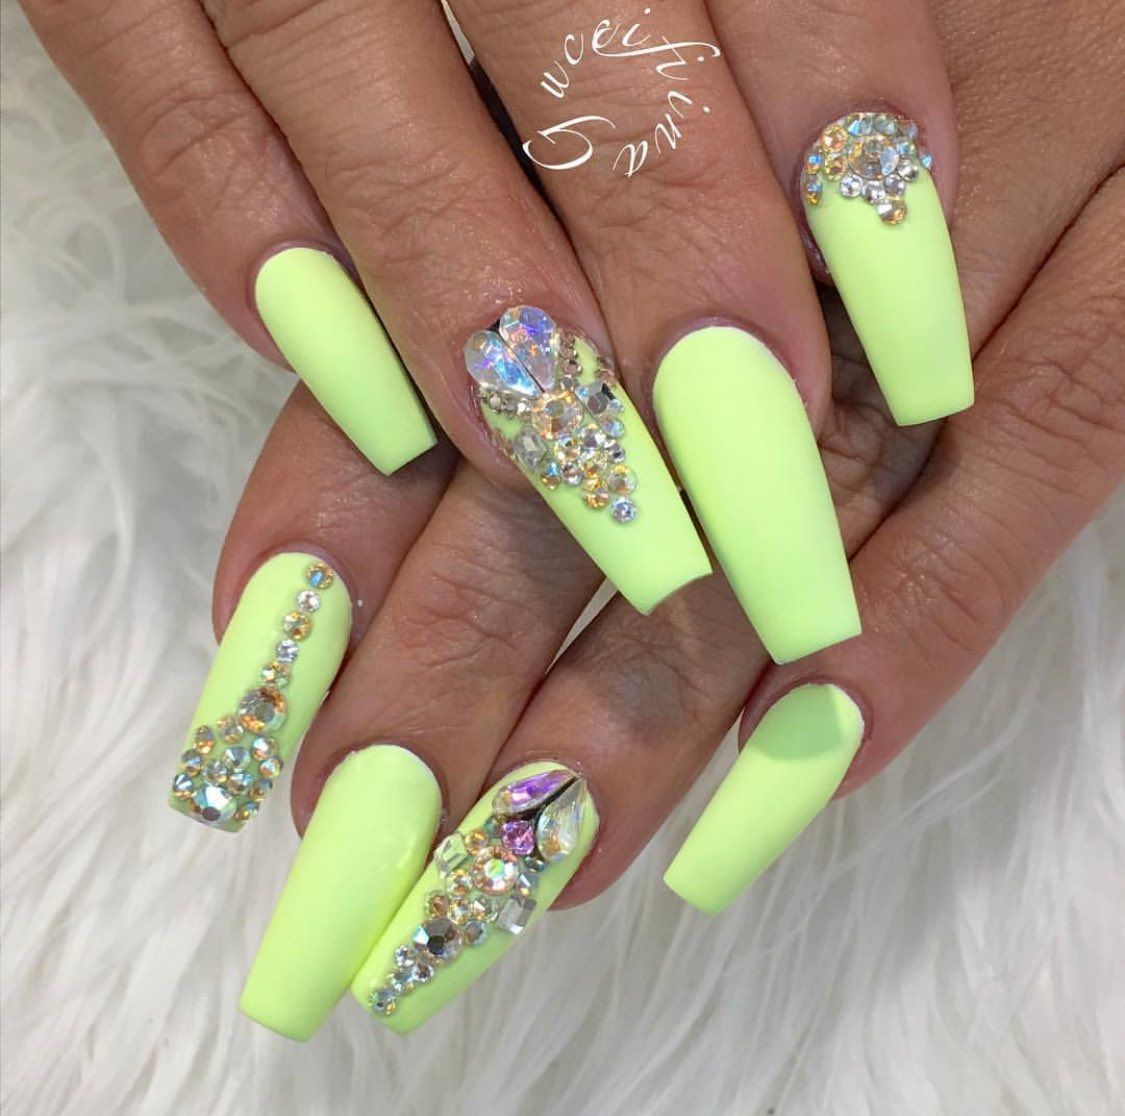 Embedded image | Nifty Nails | Pinterest | Nail nail, Fire nails and ...